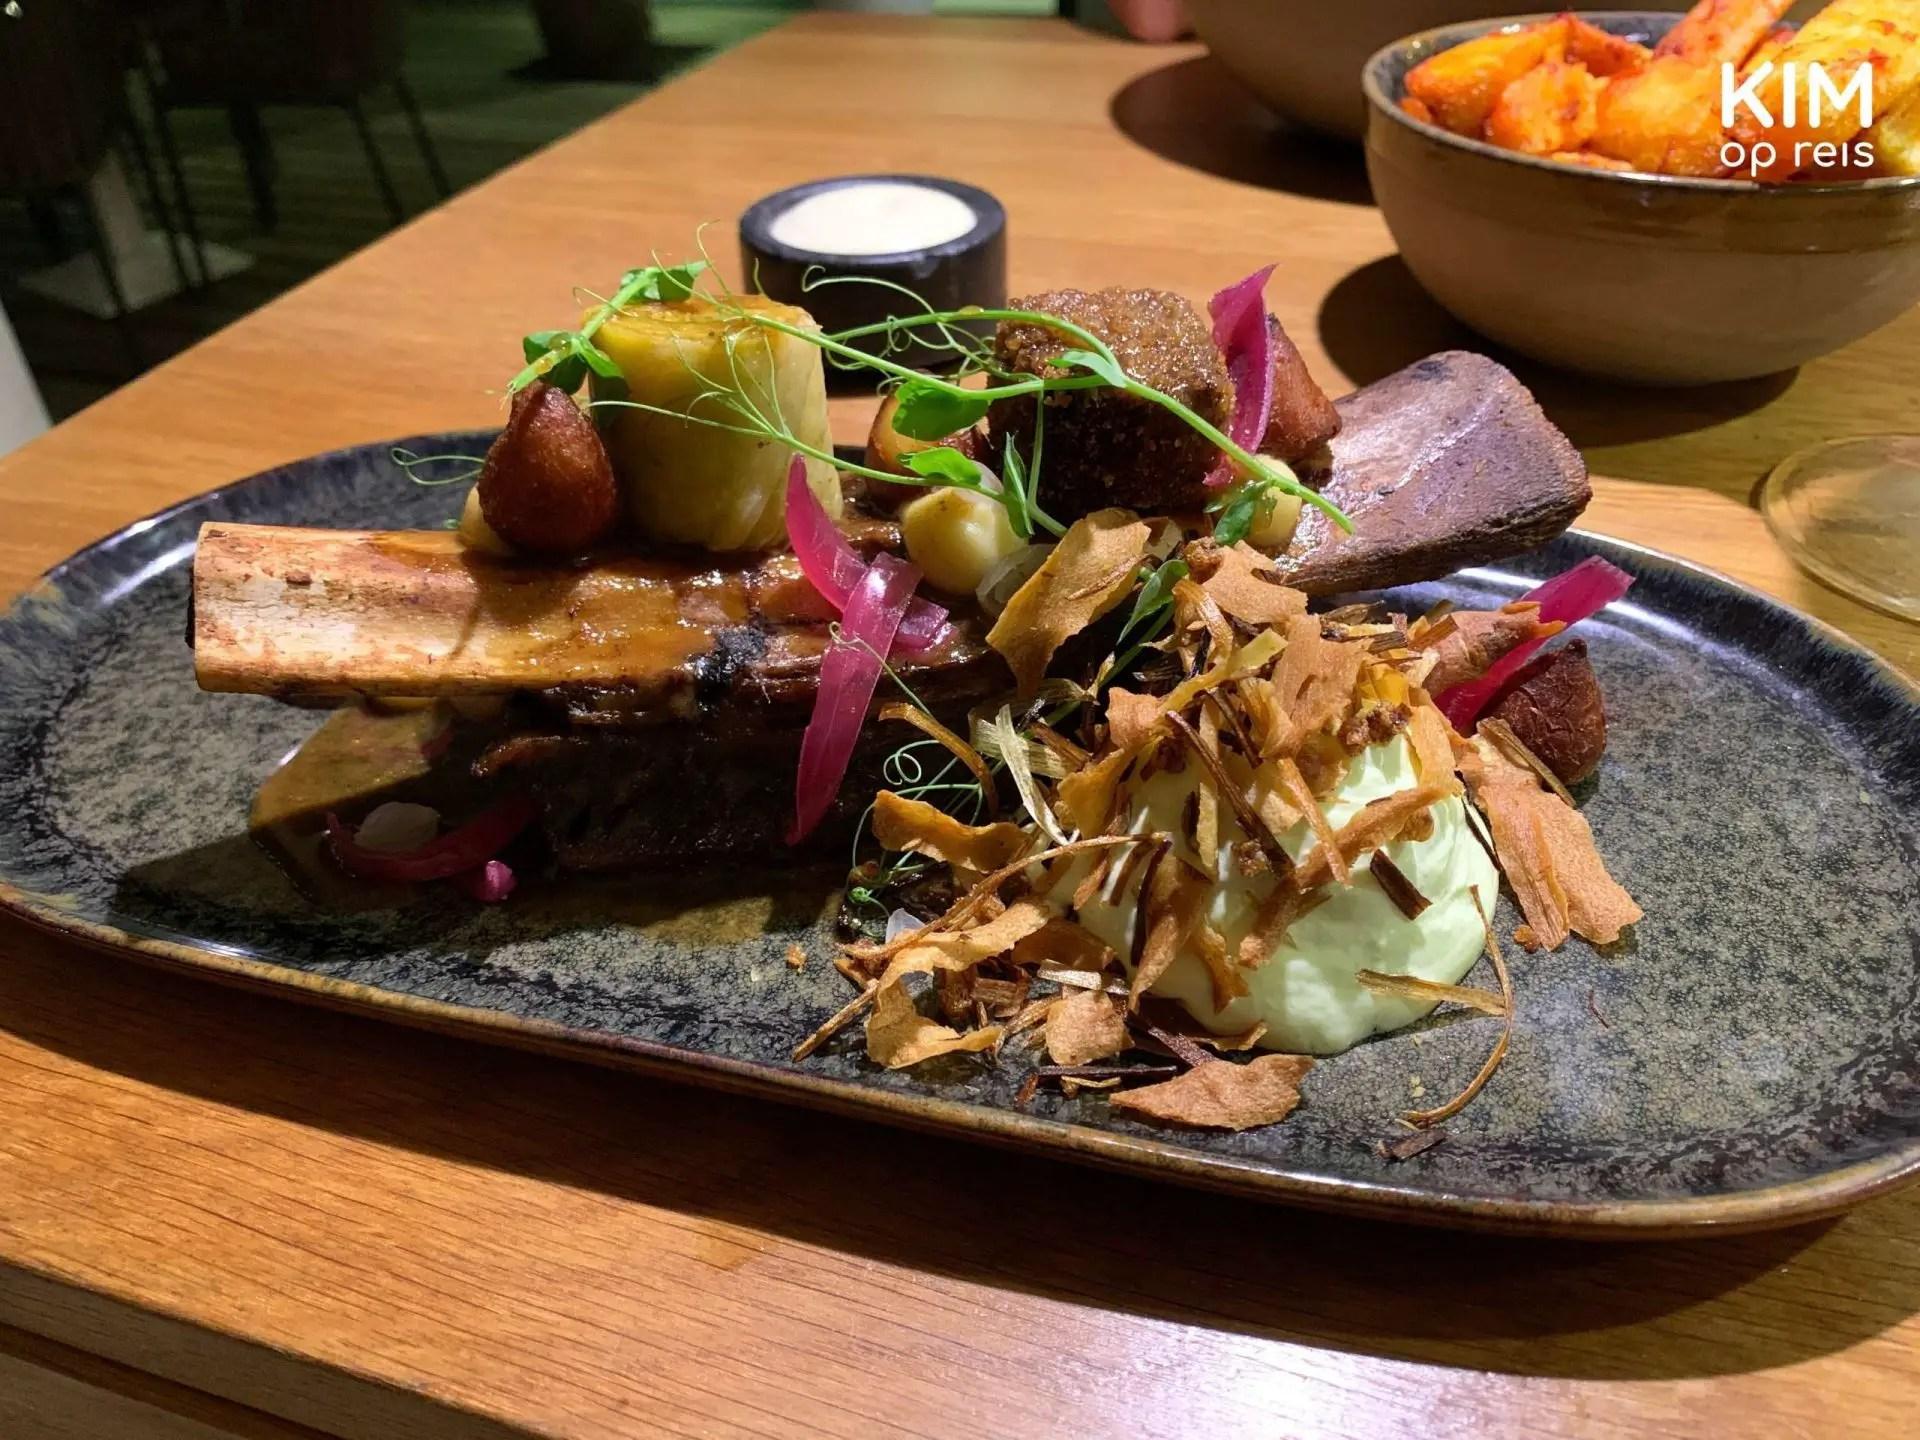 Nultwintig restaurant Curaçao: chique opgemaakt bord